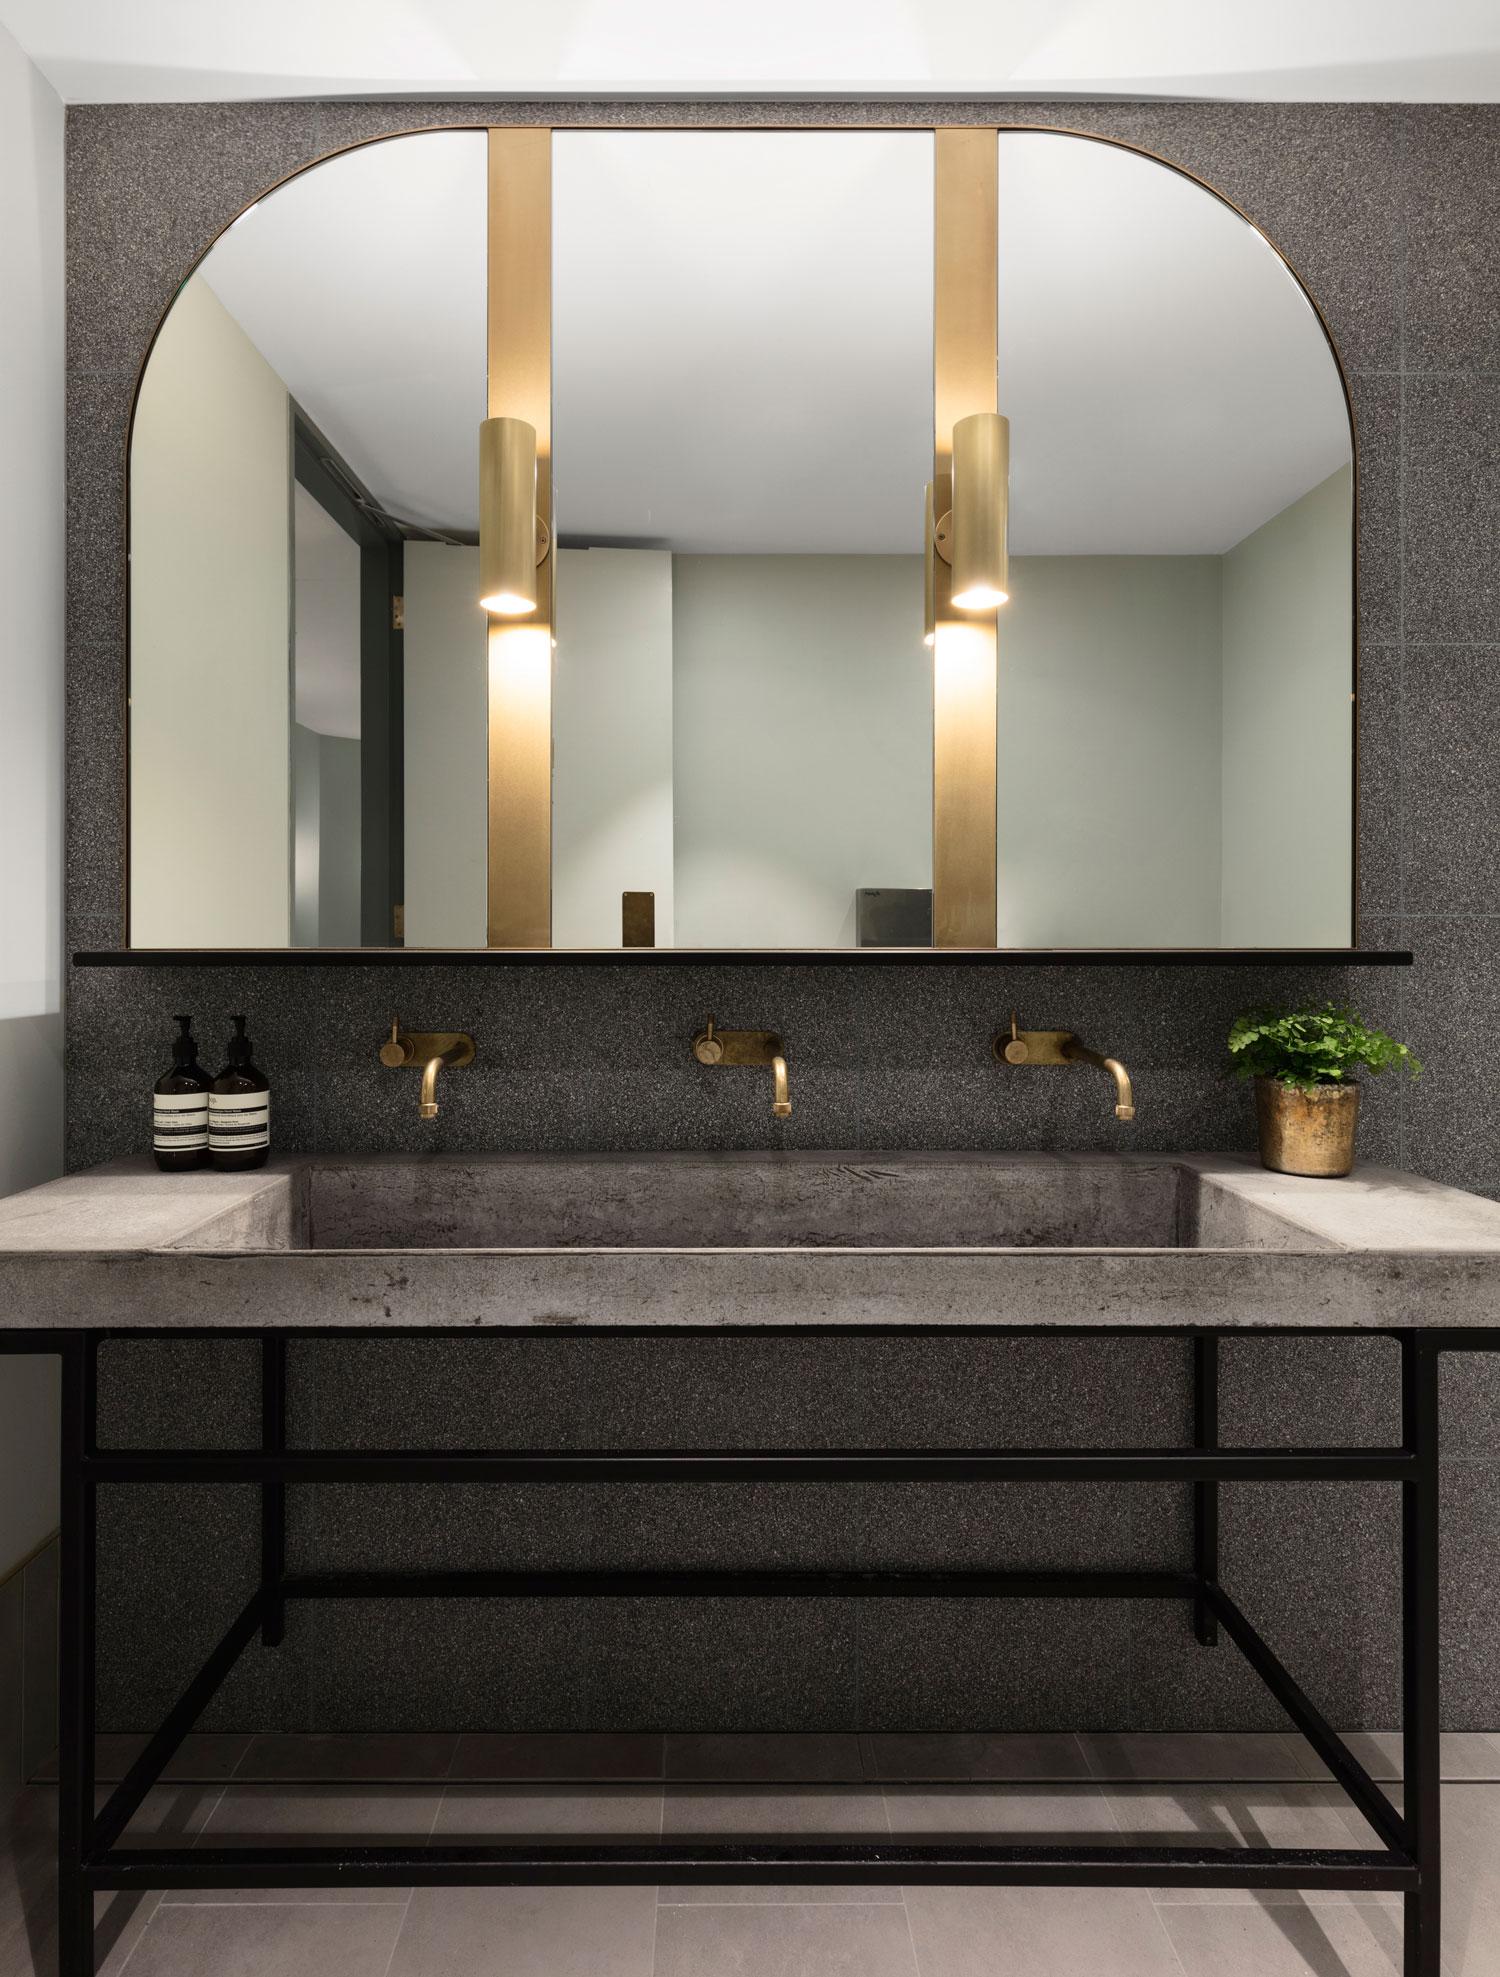 Buena Vista Hotel in Mosman, Australia by SJB | Yellowtrace